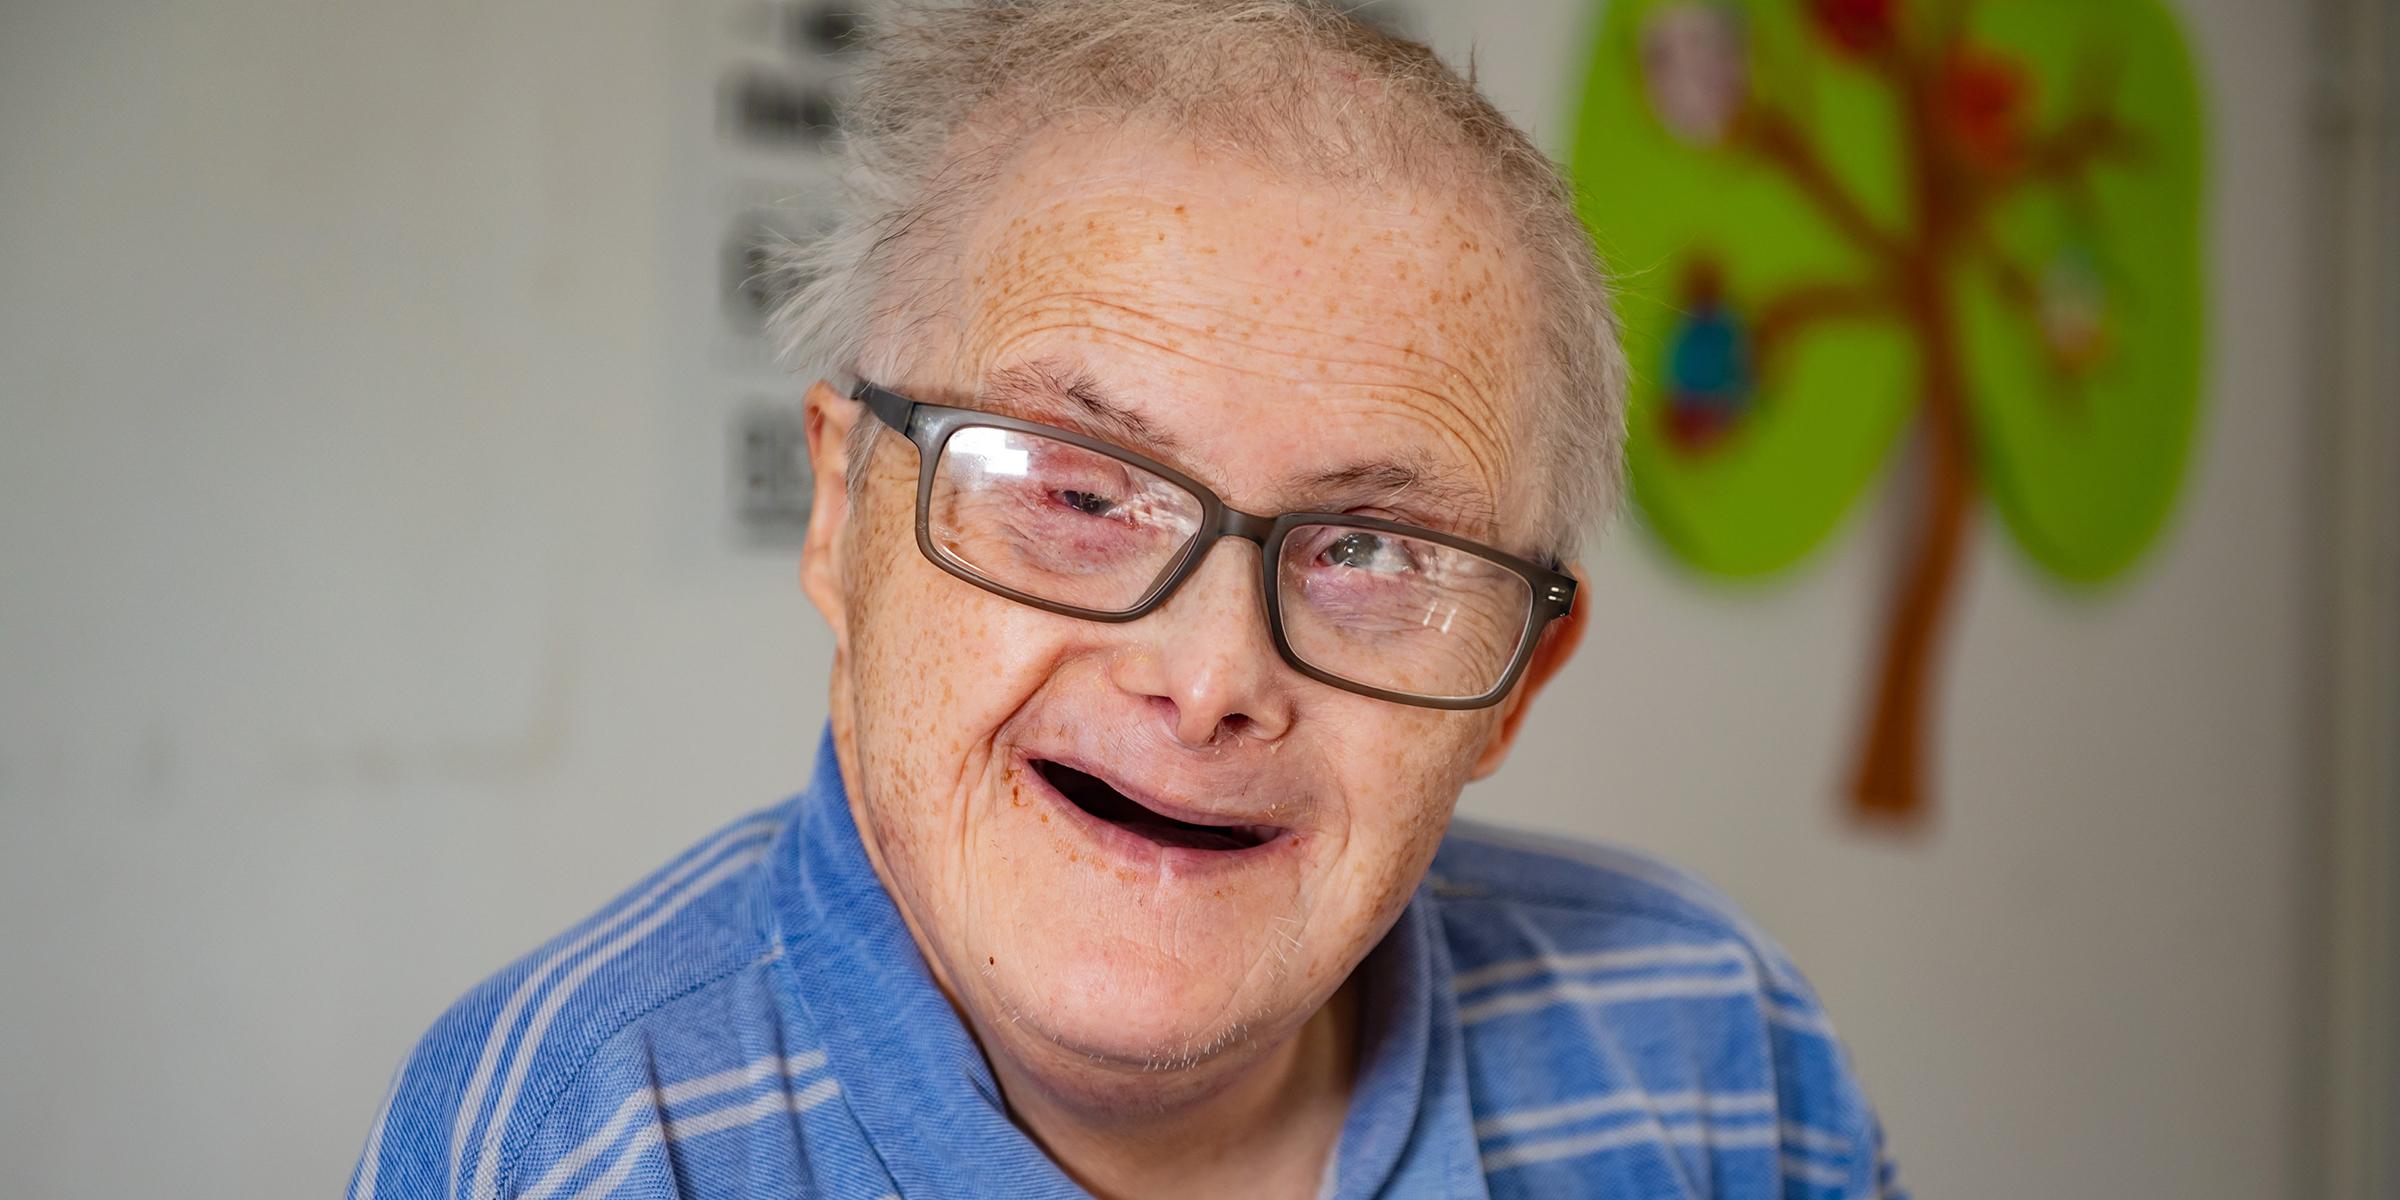 British man with Down syndrome celebrates 77th birthday